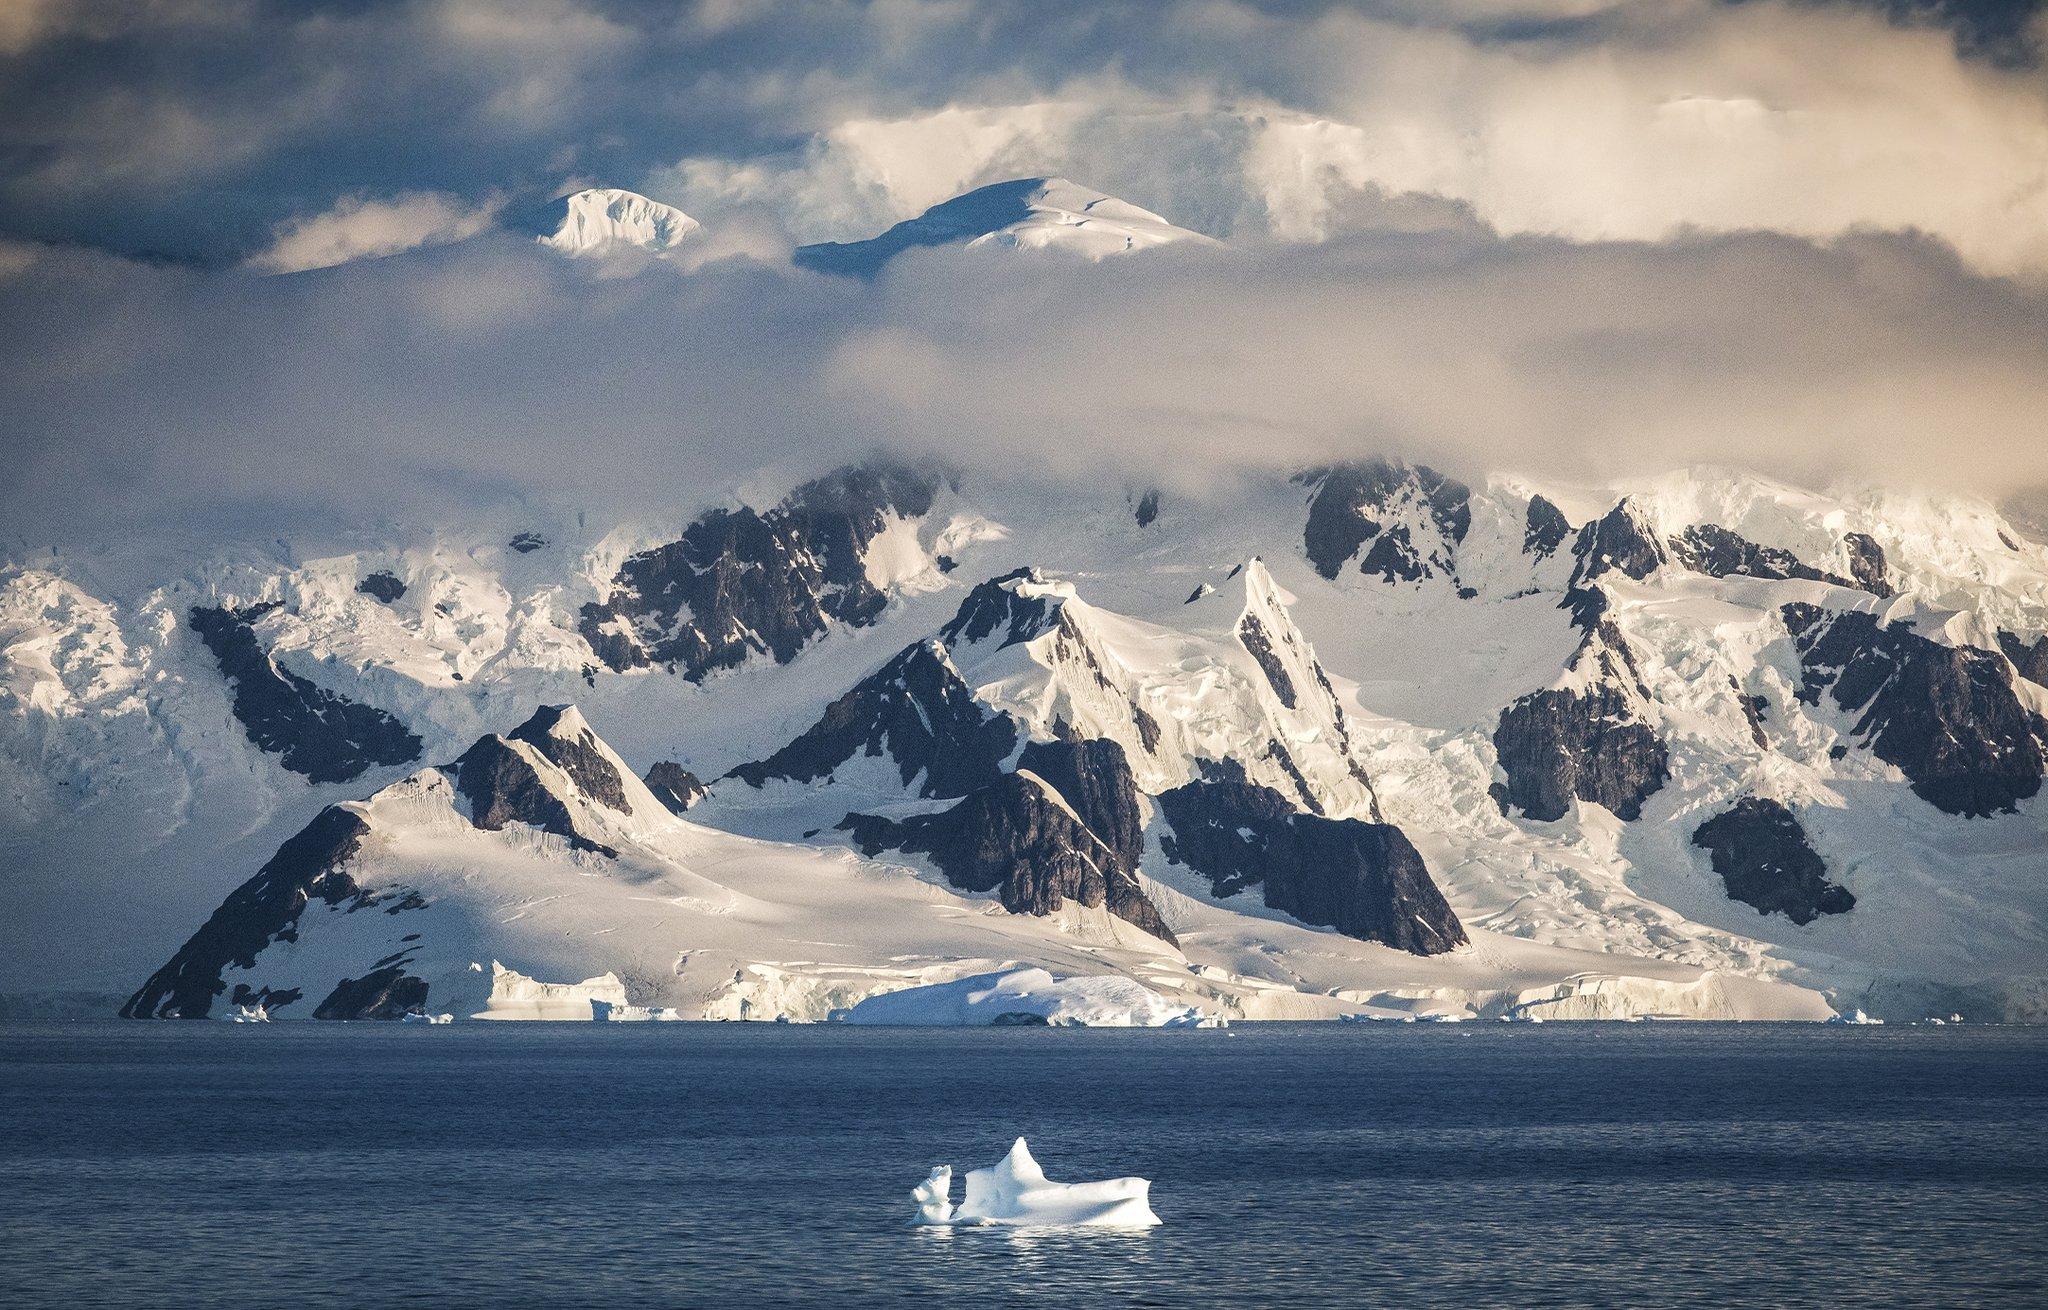 Wallpaper   Epic Antarctica   Paul Zizka Photography 2048x1310